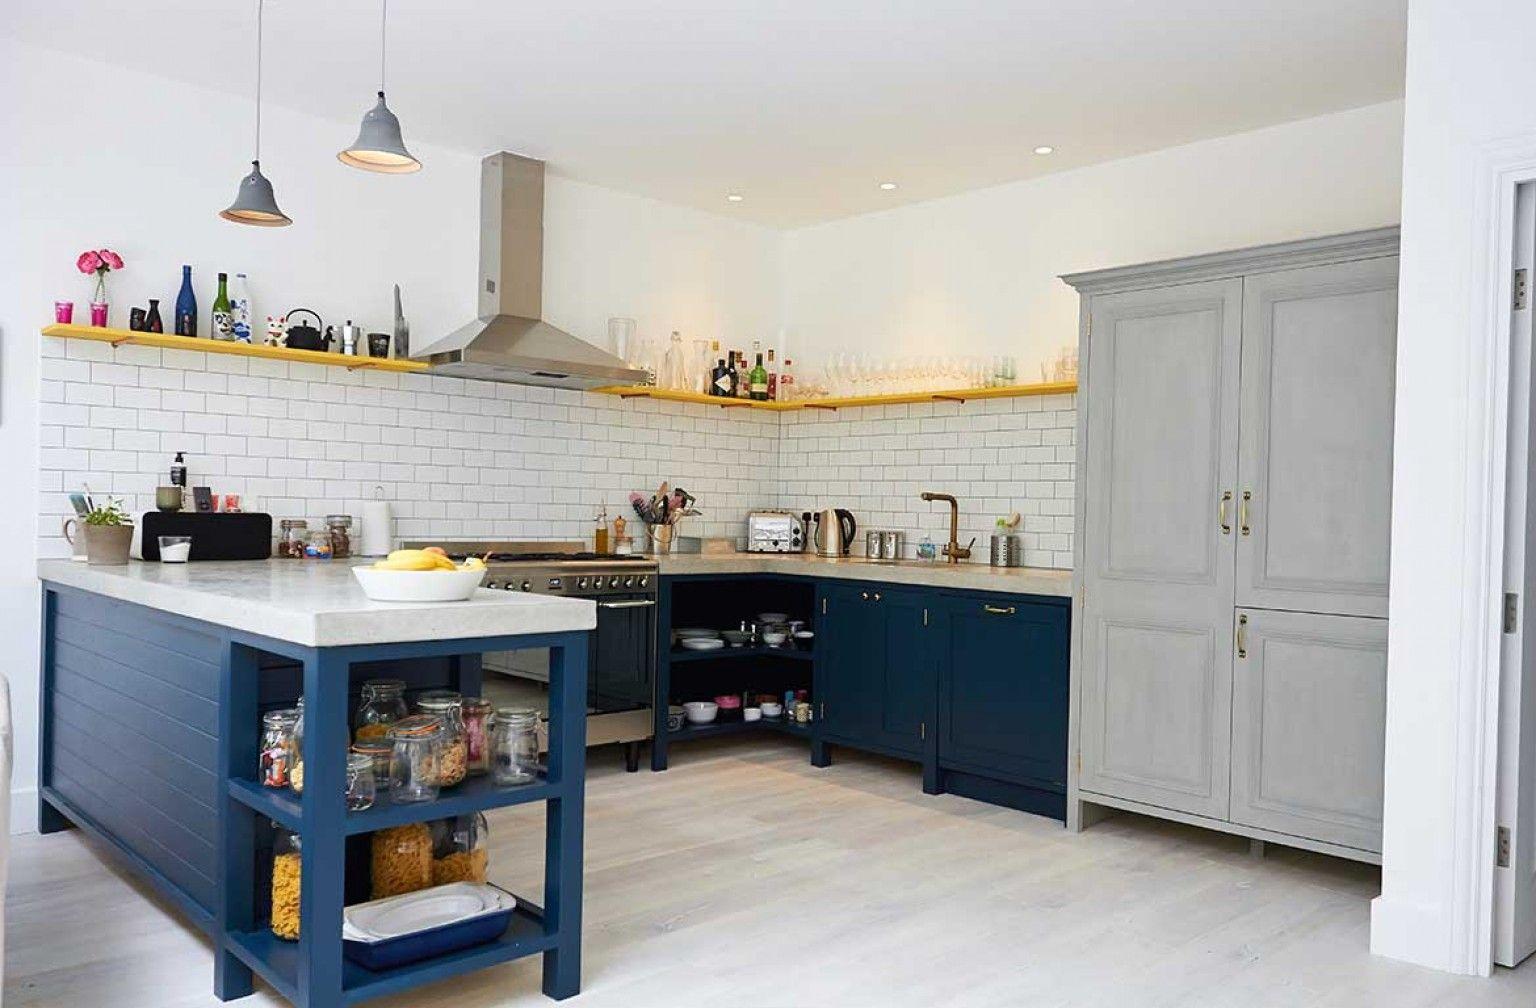 Kitchens Loft Kitchen Upcycled Kitchen Cabinets Contemporary Kitchen Design